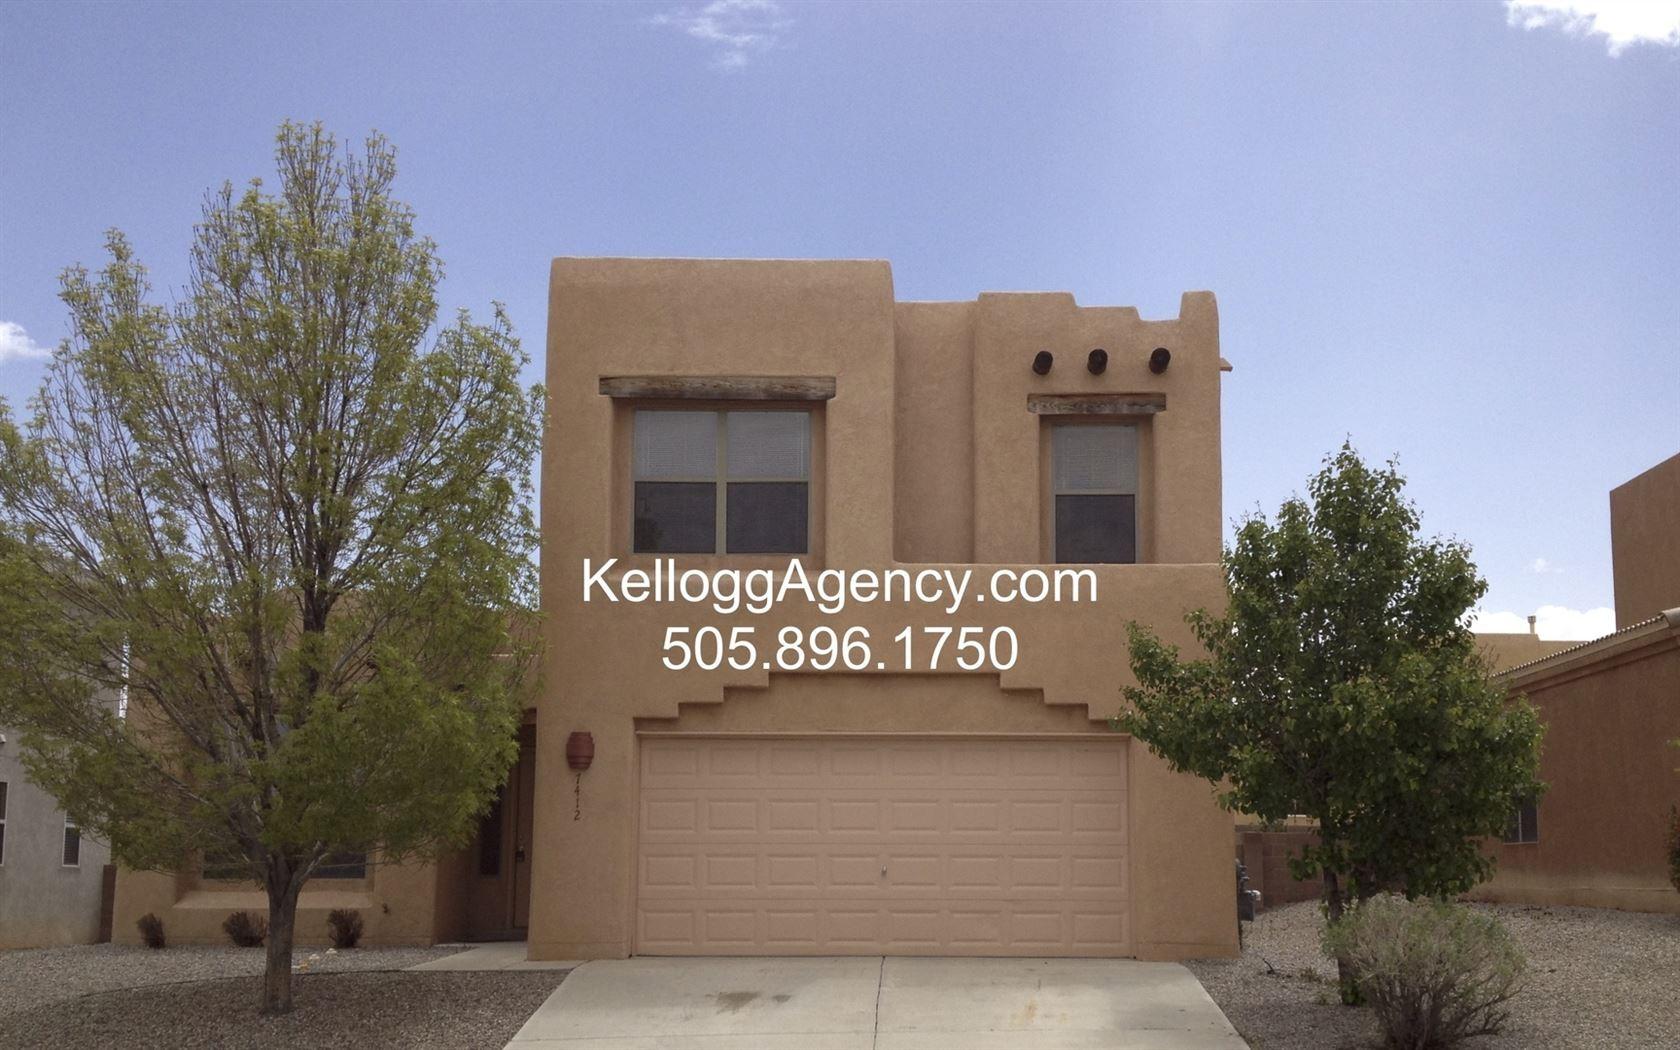 7448 Sanderling Rd Nw Albuquerque Nm 87114 3 Bedroom